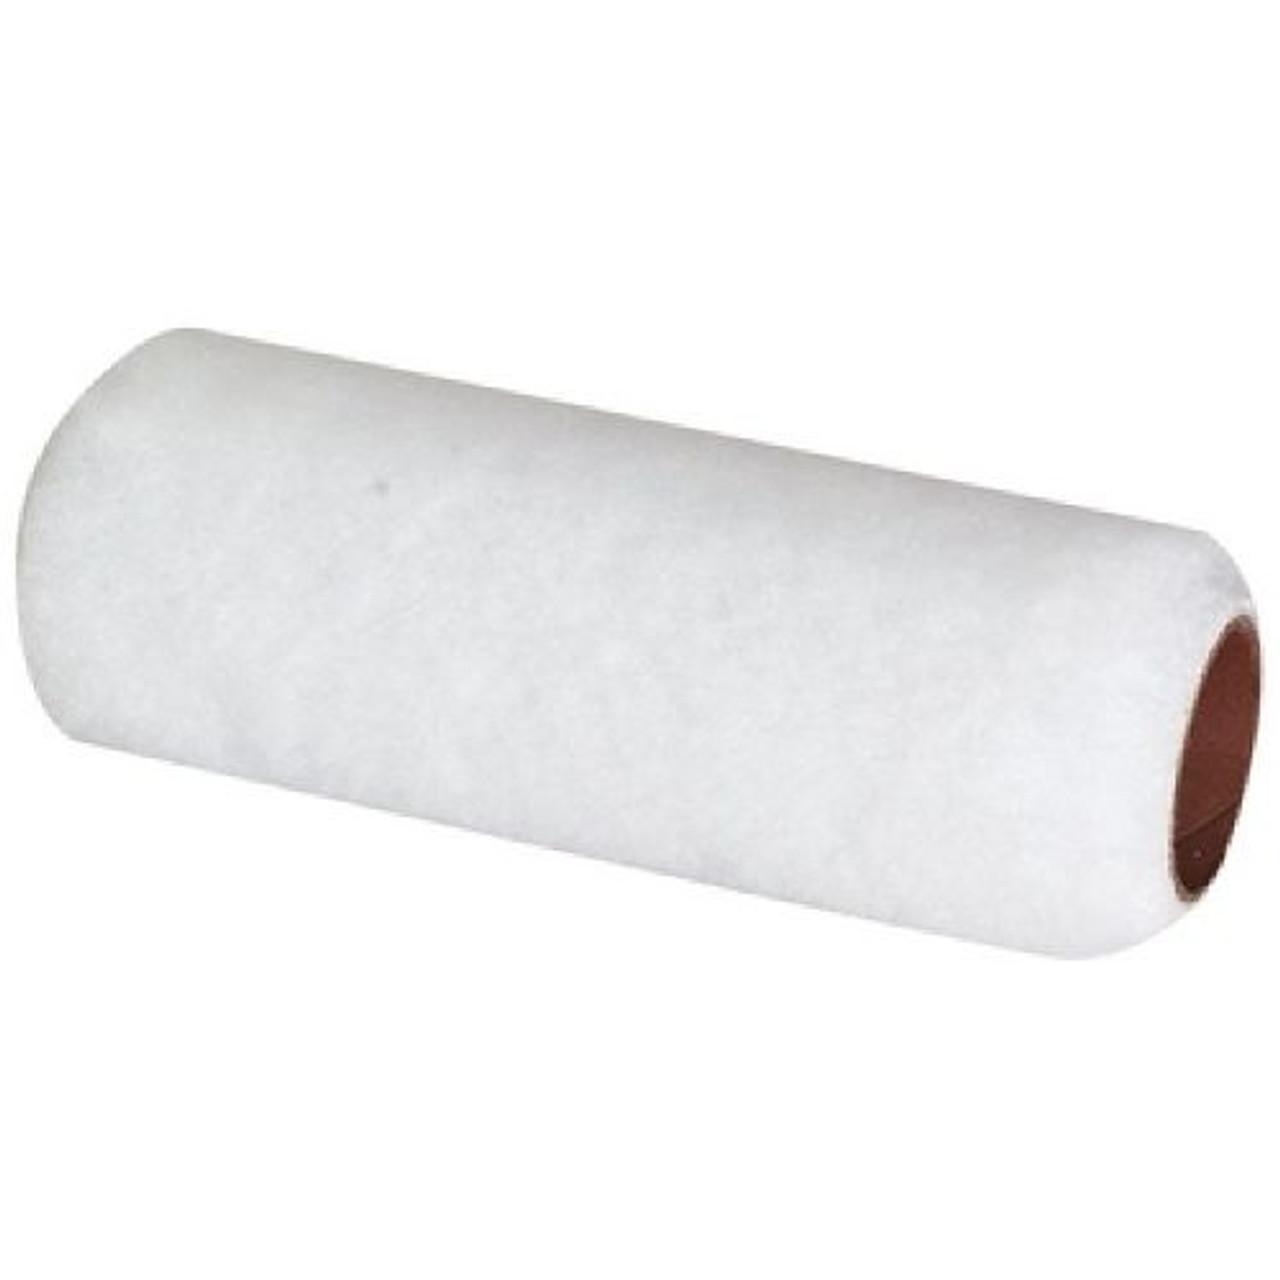 Seachoice 12 Inch Polyester Paint Roller - Best for Fiberglass Resins or Bottom Paint